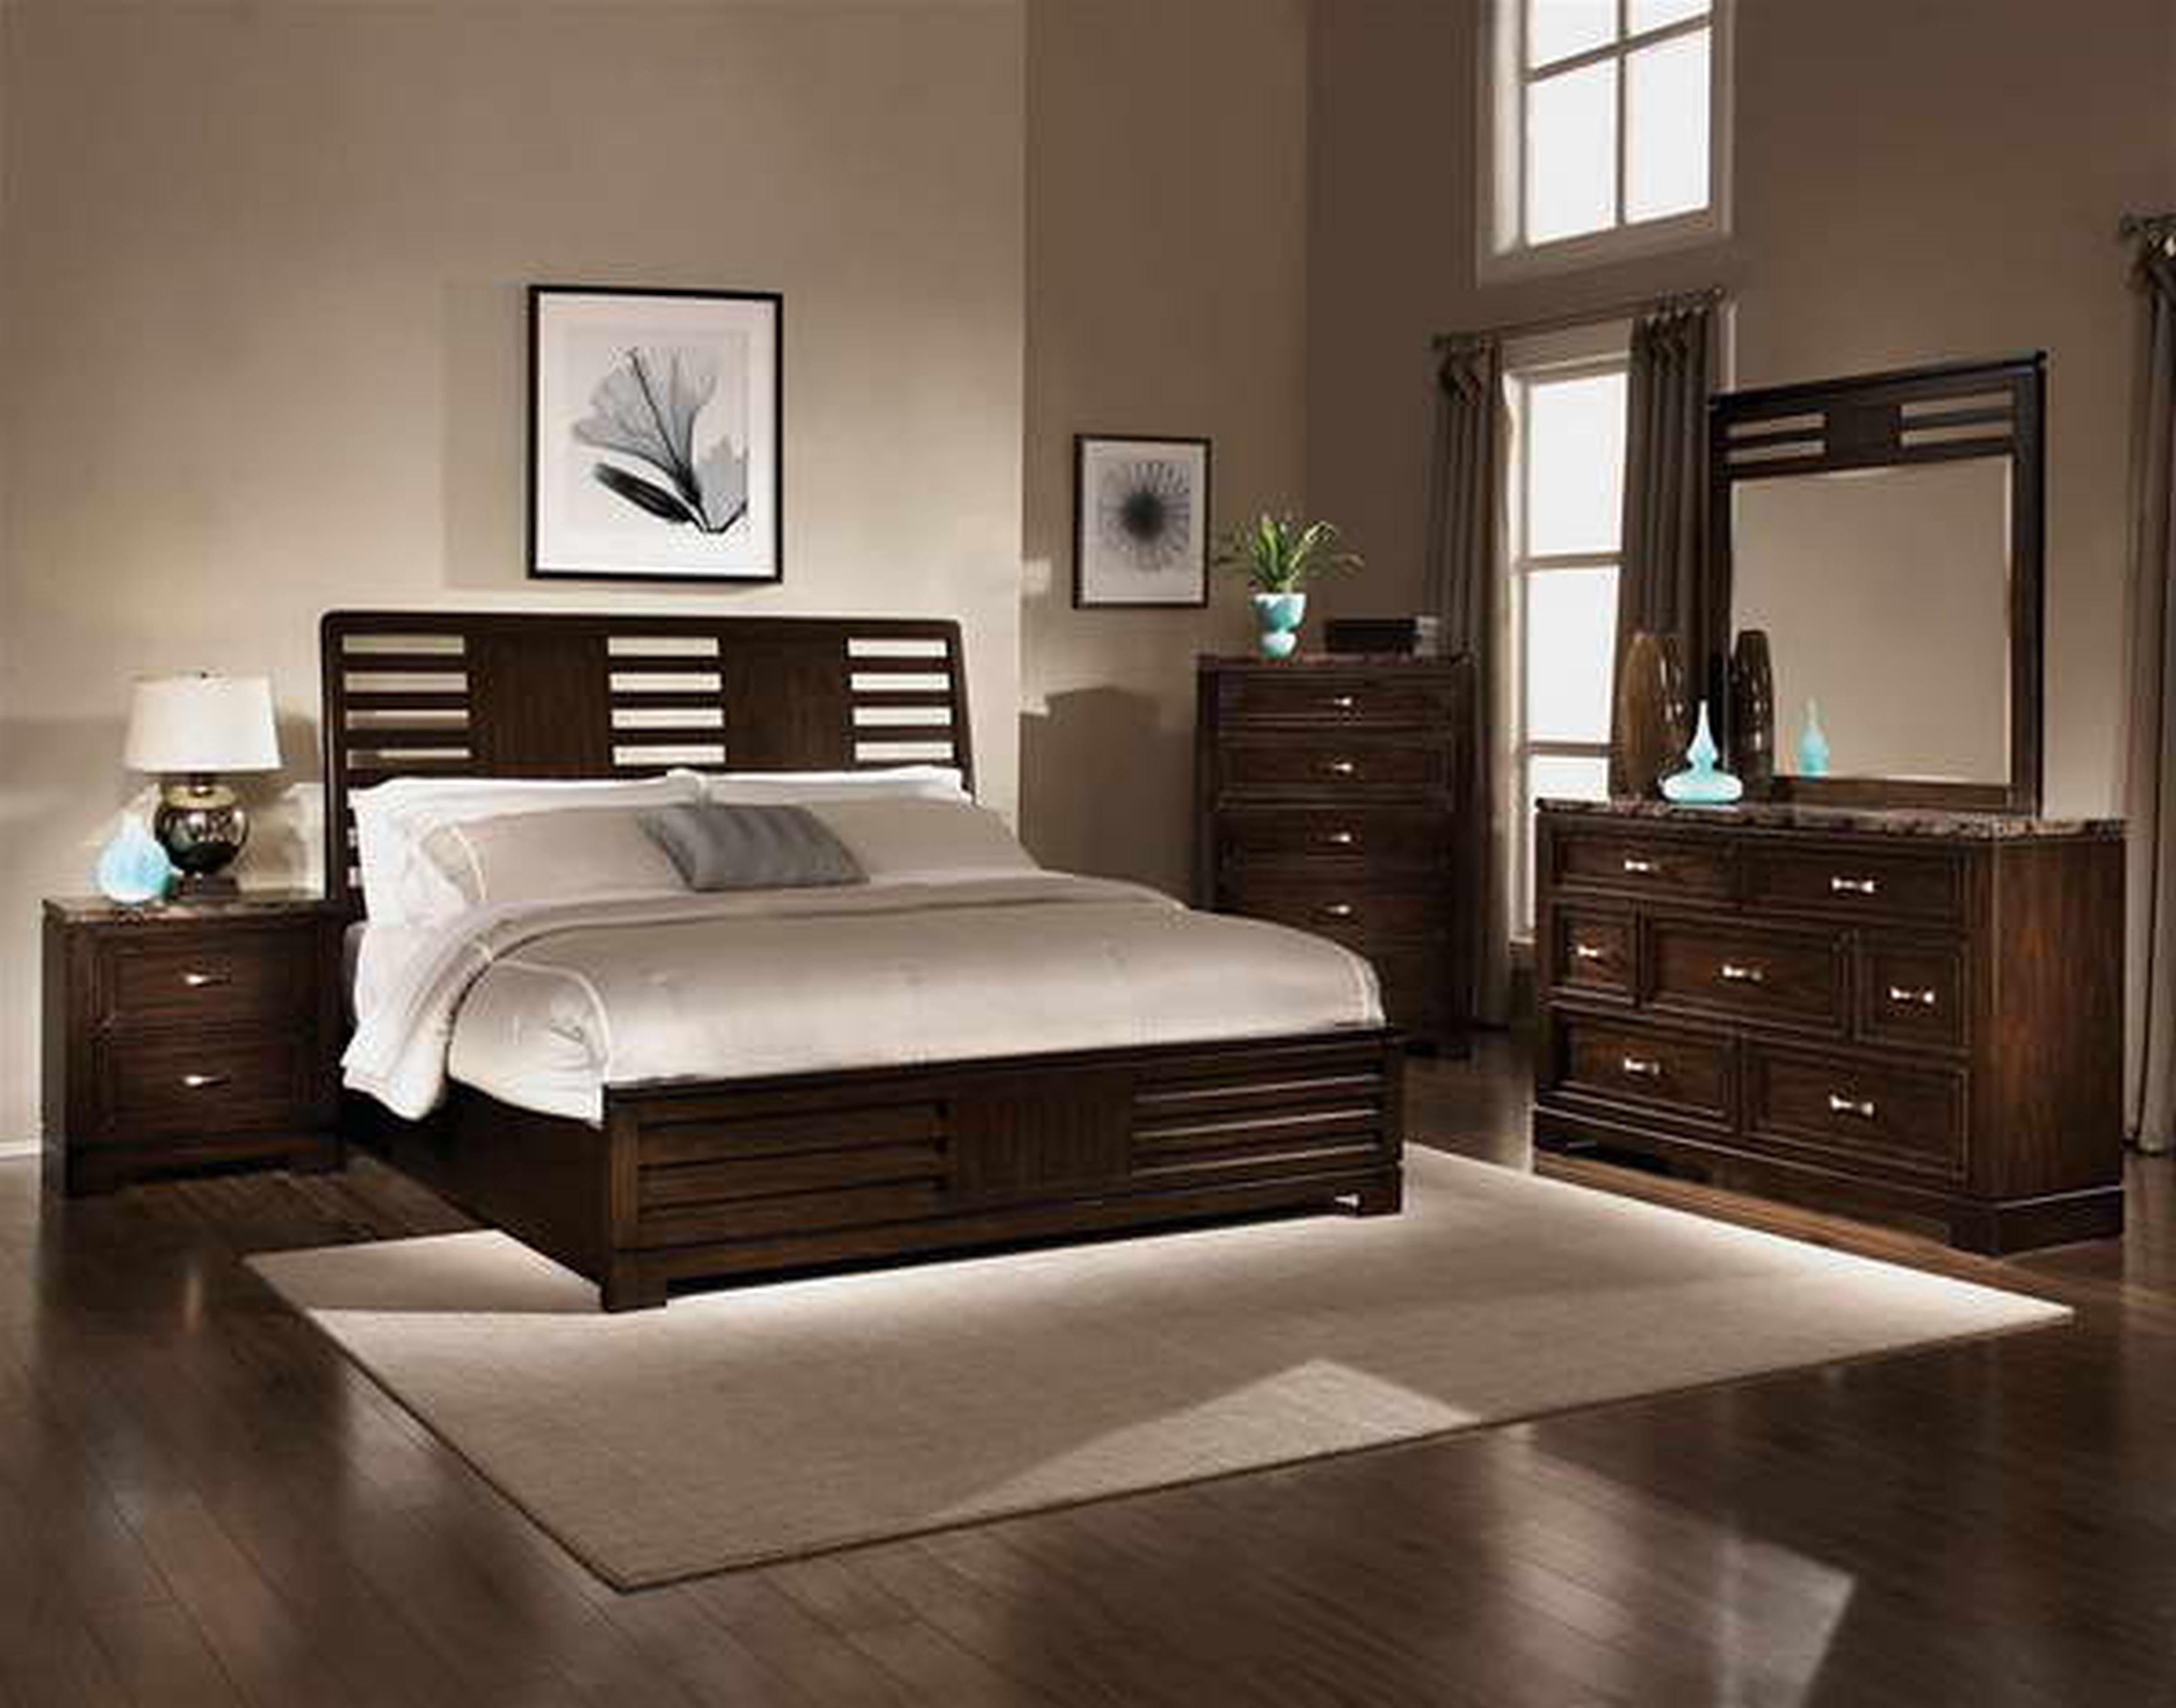 black oversized bedroom furniture photo - 4